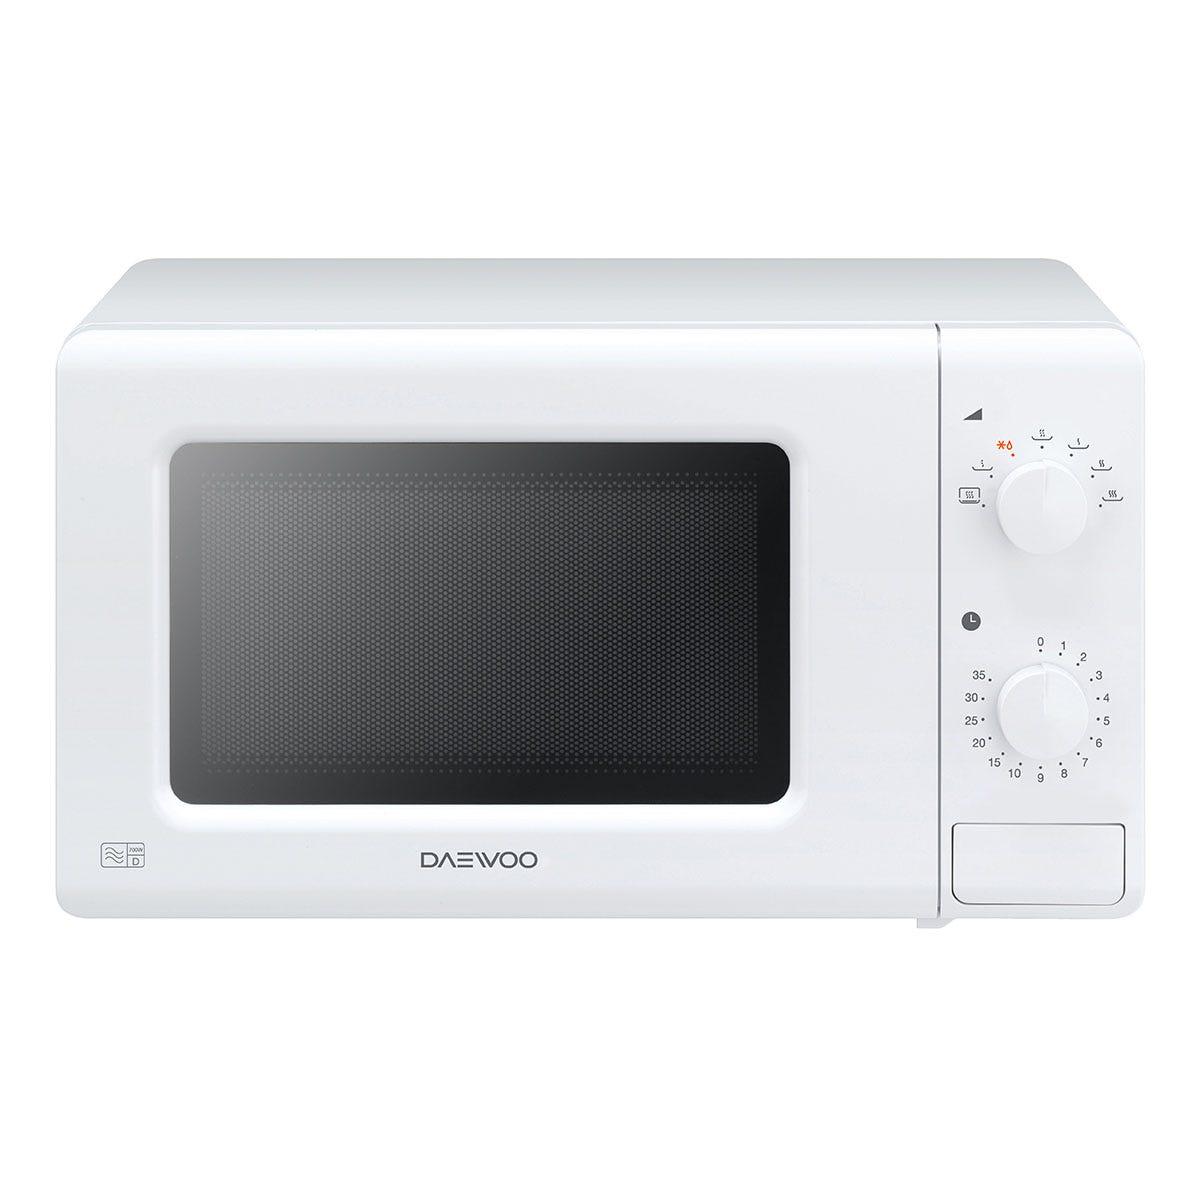 Daewoo KOR6M17 20L 700W Solo Manual Microwave - White